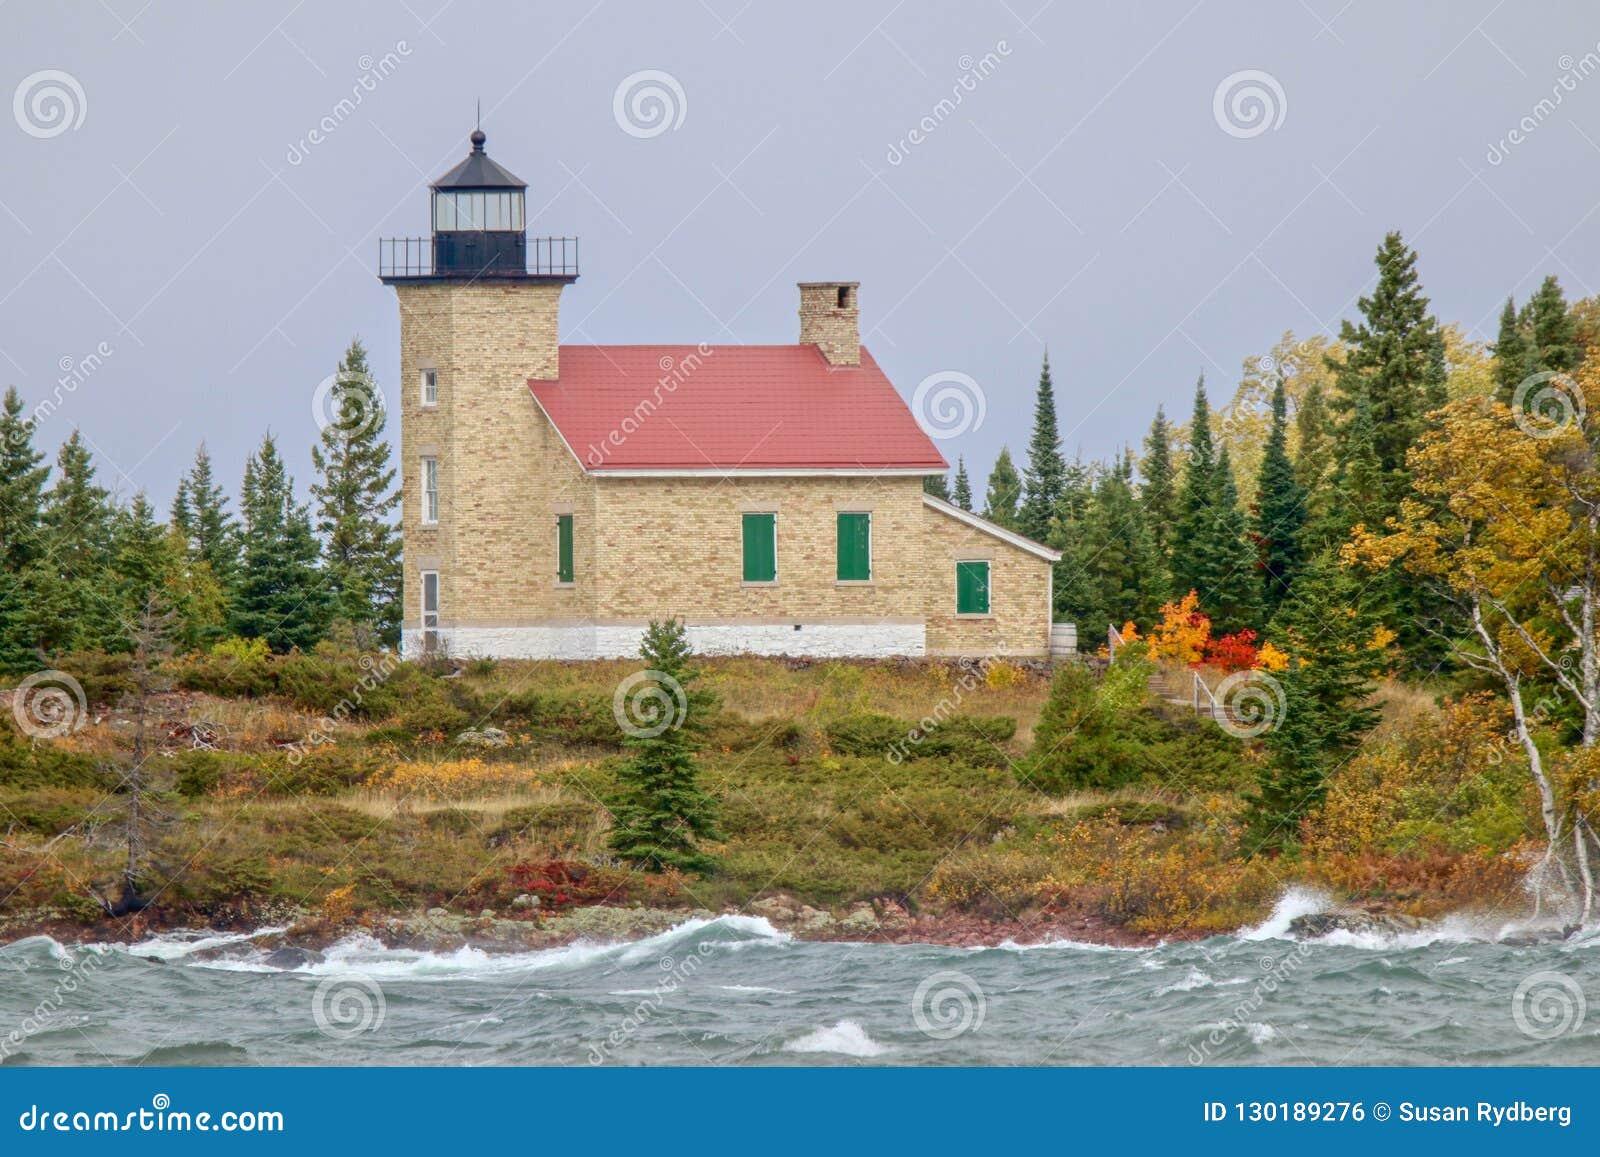 Copper Harbor Lighthouse in Upper Peninsula of Michigan